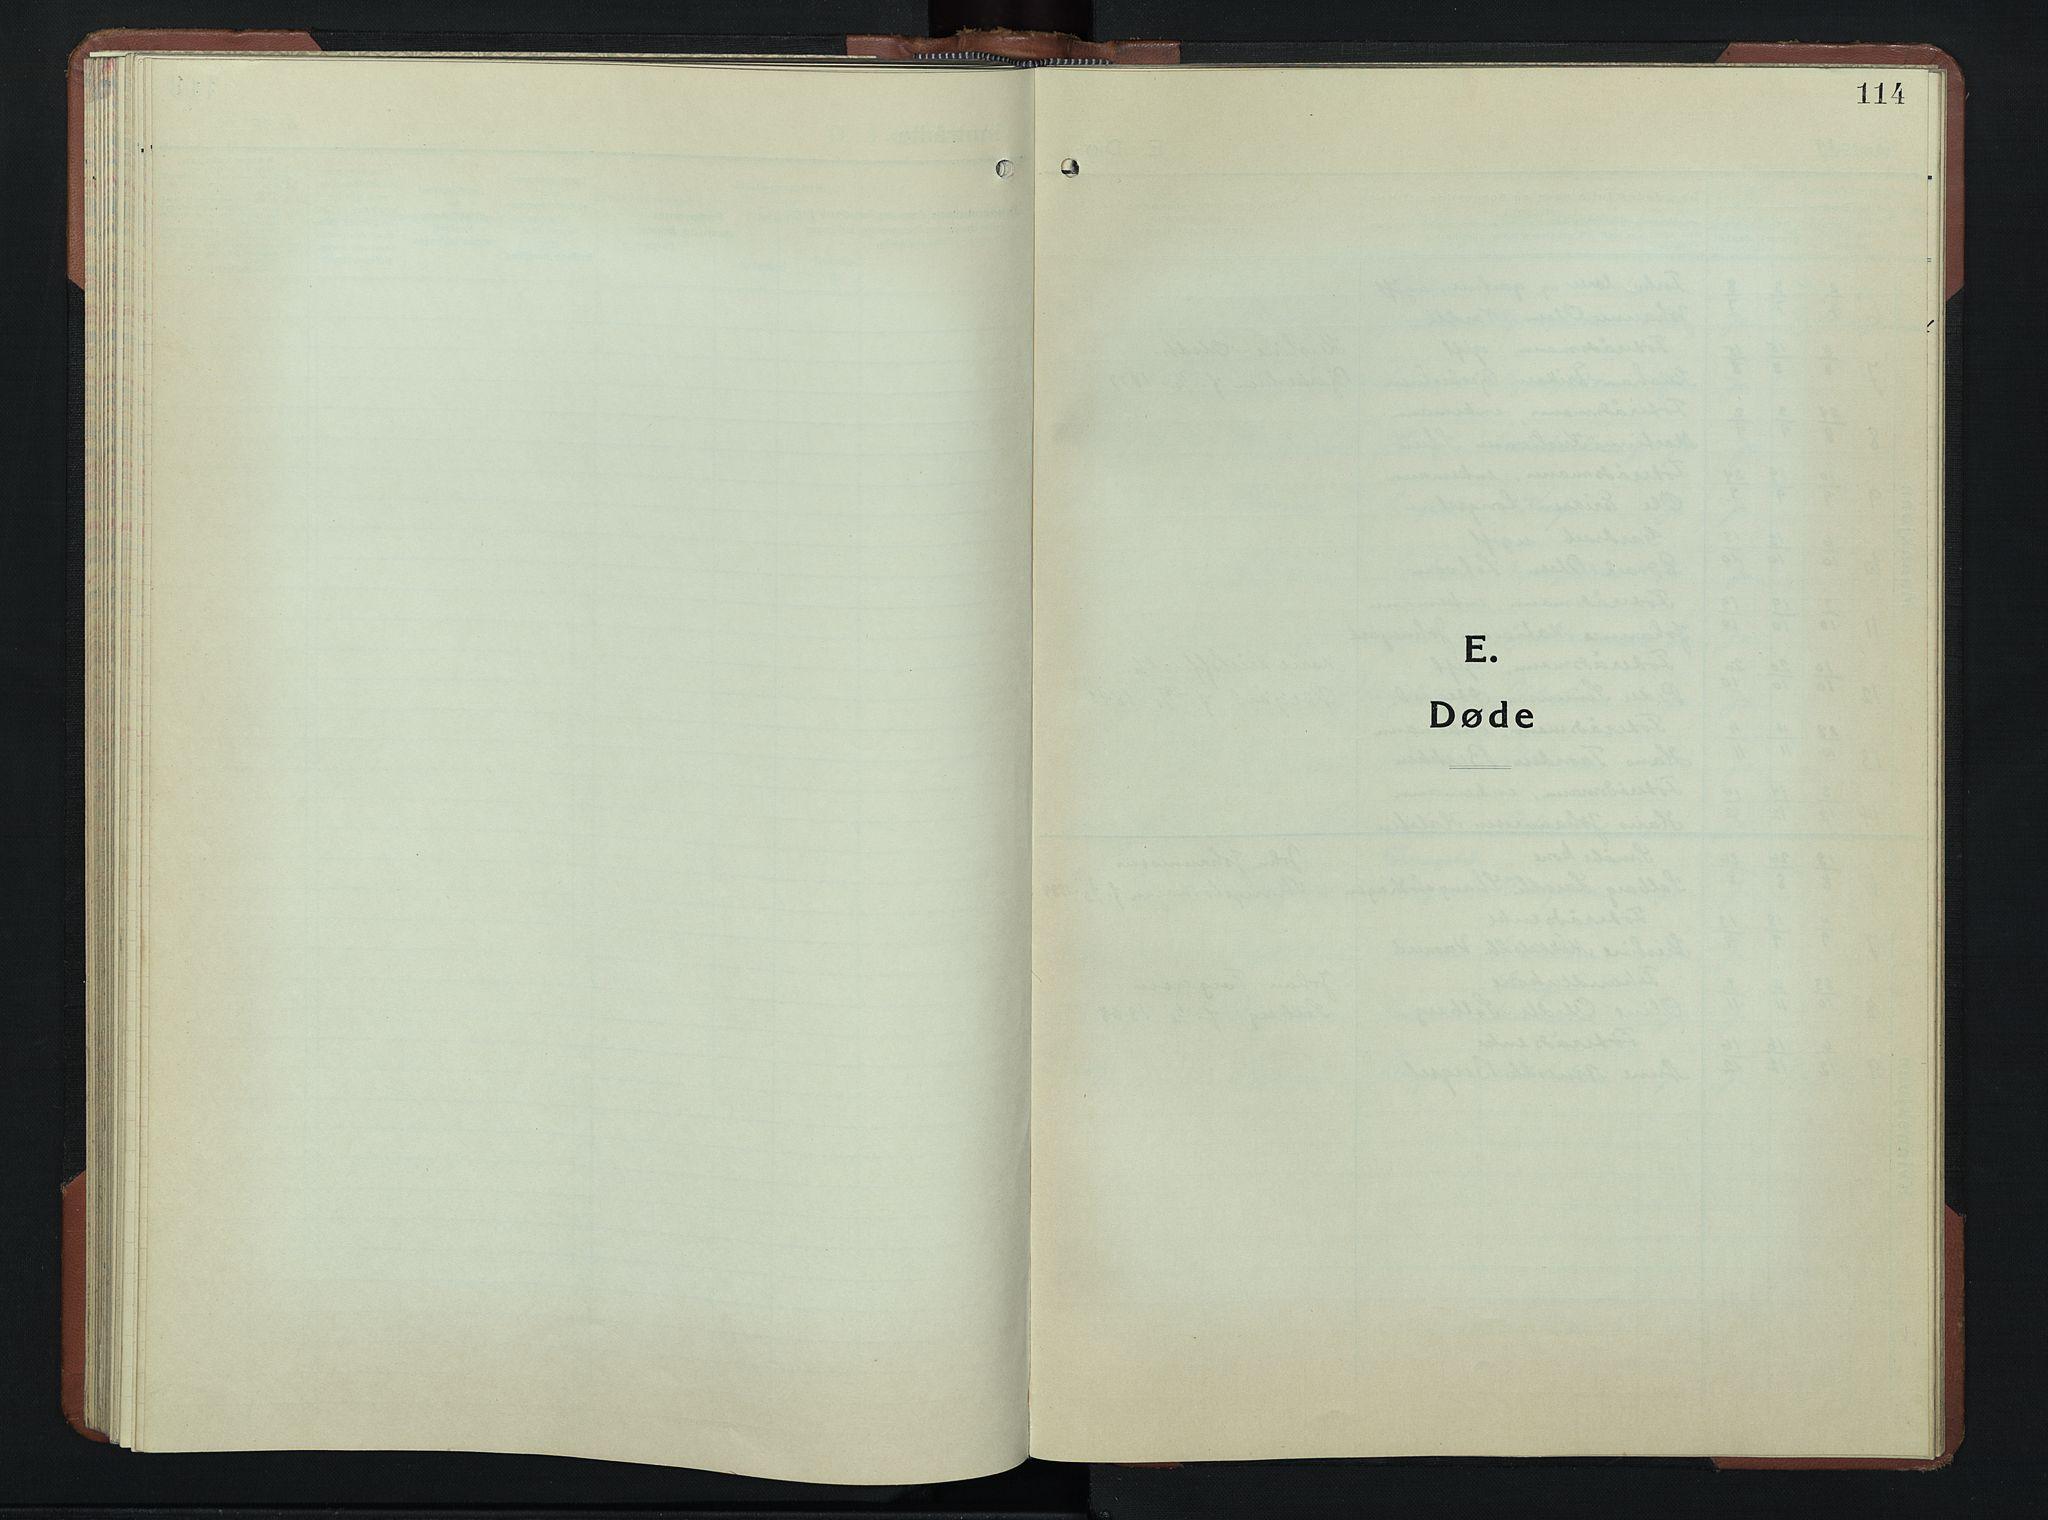 SAH, Øyer prestekontor, Klokkerbok nr. 9, 1939-1953, s. 114